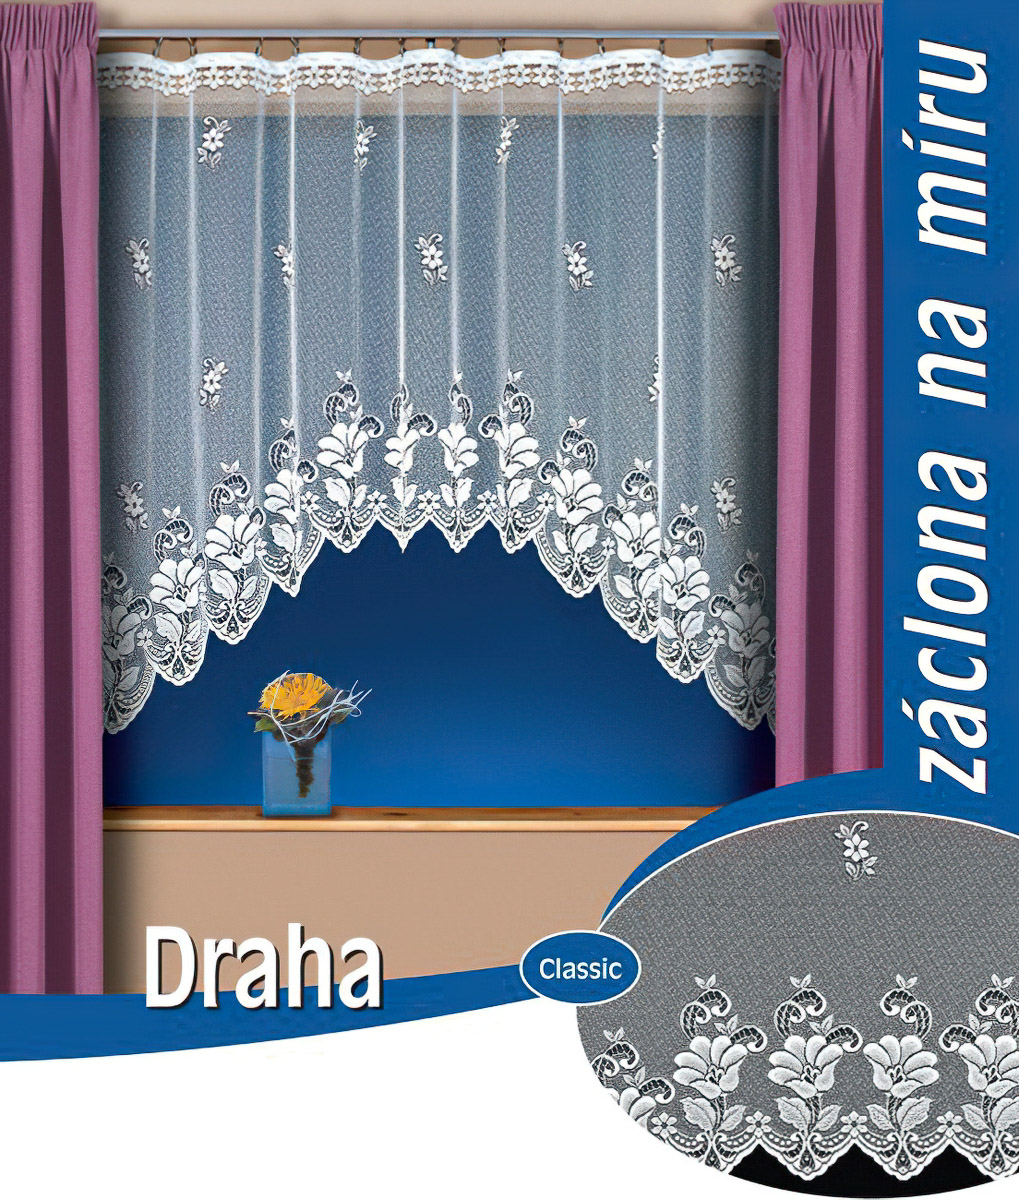 Tylex kusová záclona DRAHA jednobarevná bílá, výška 250 cm x šířka 200 cm (na dveře)